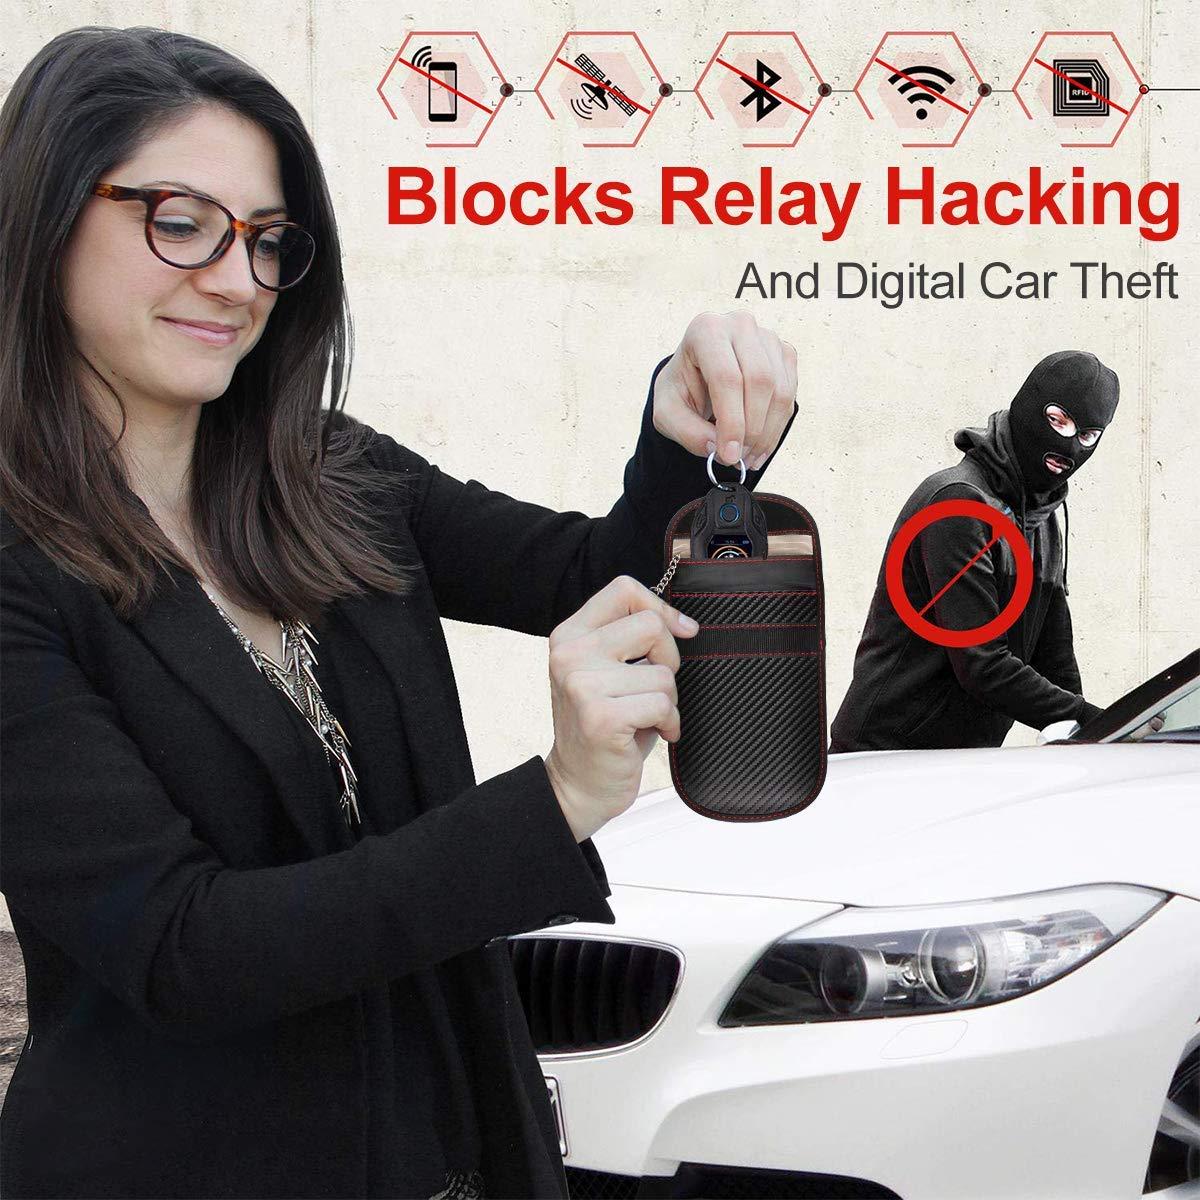 Large Faraday Bag for Cell Phone 2pcs Faraday Bag Key Fob Signal Blocking Anti Theft Keys Safe Signal Blocking Bag Keyless Entry RFID Fob Key Security Box Protector Signal Blocking Pouch for Car